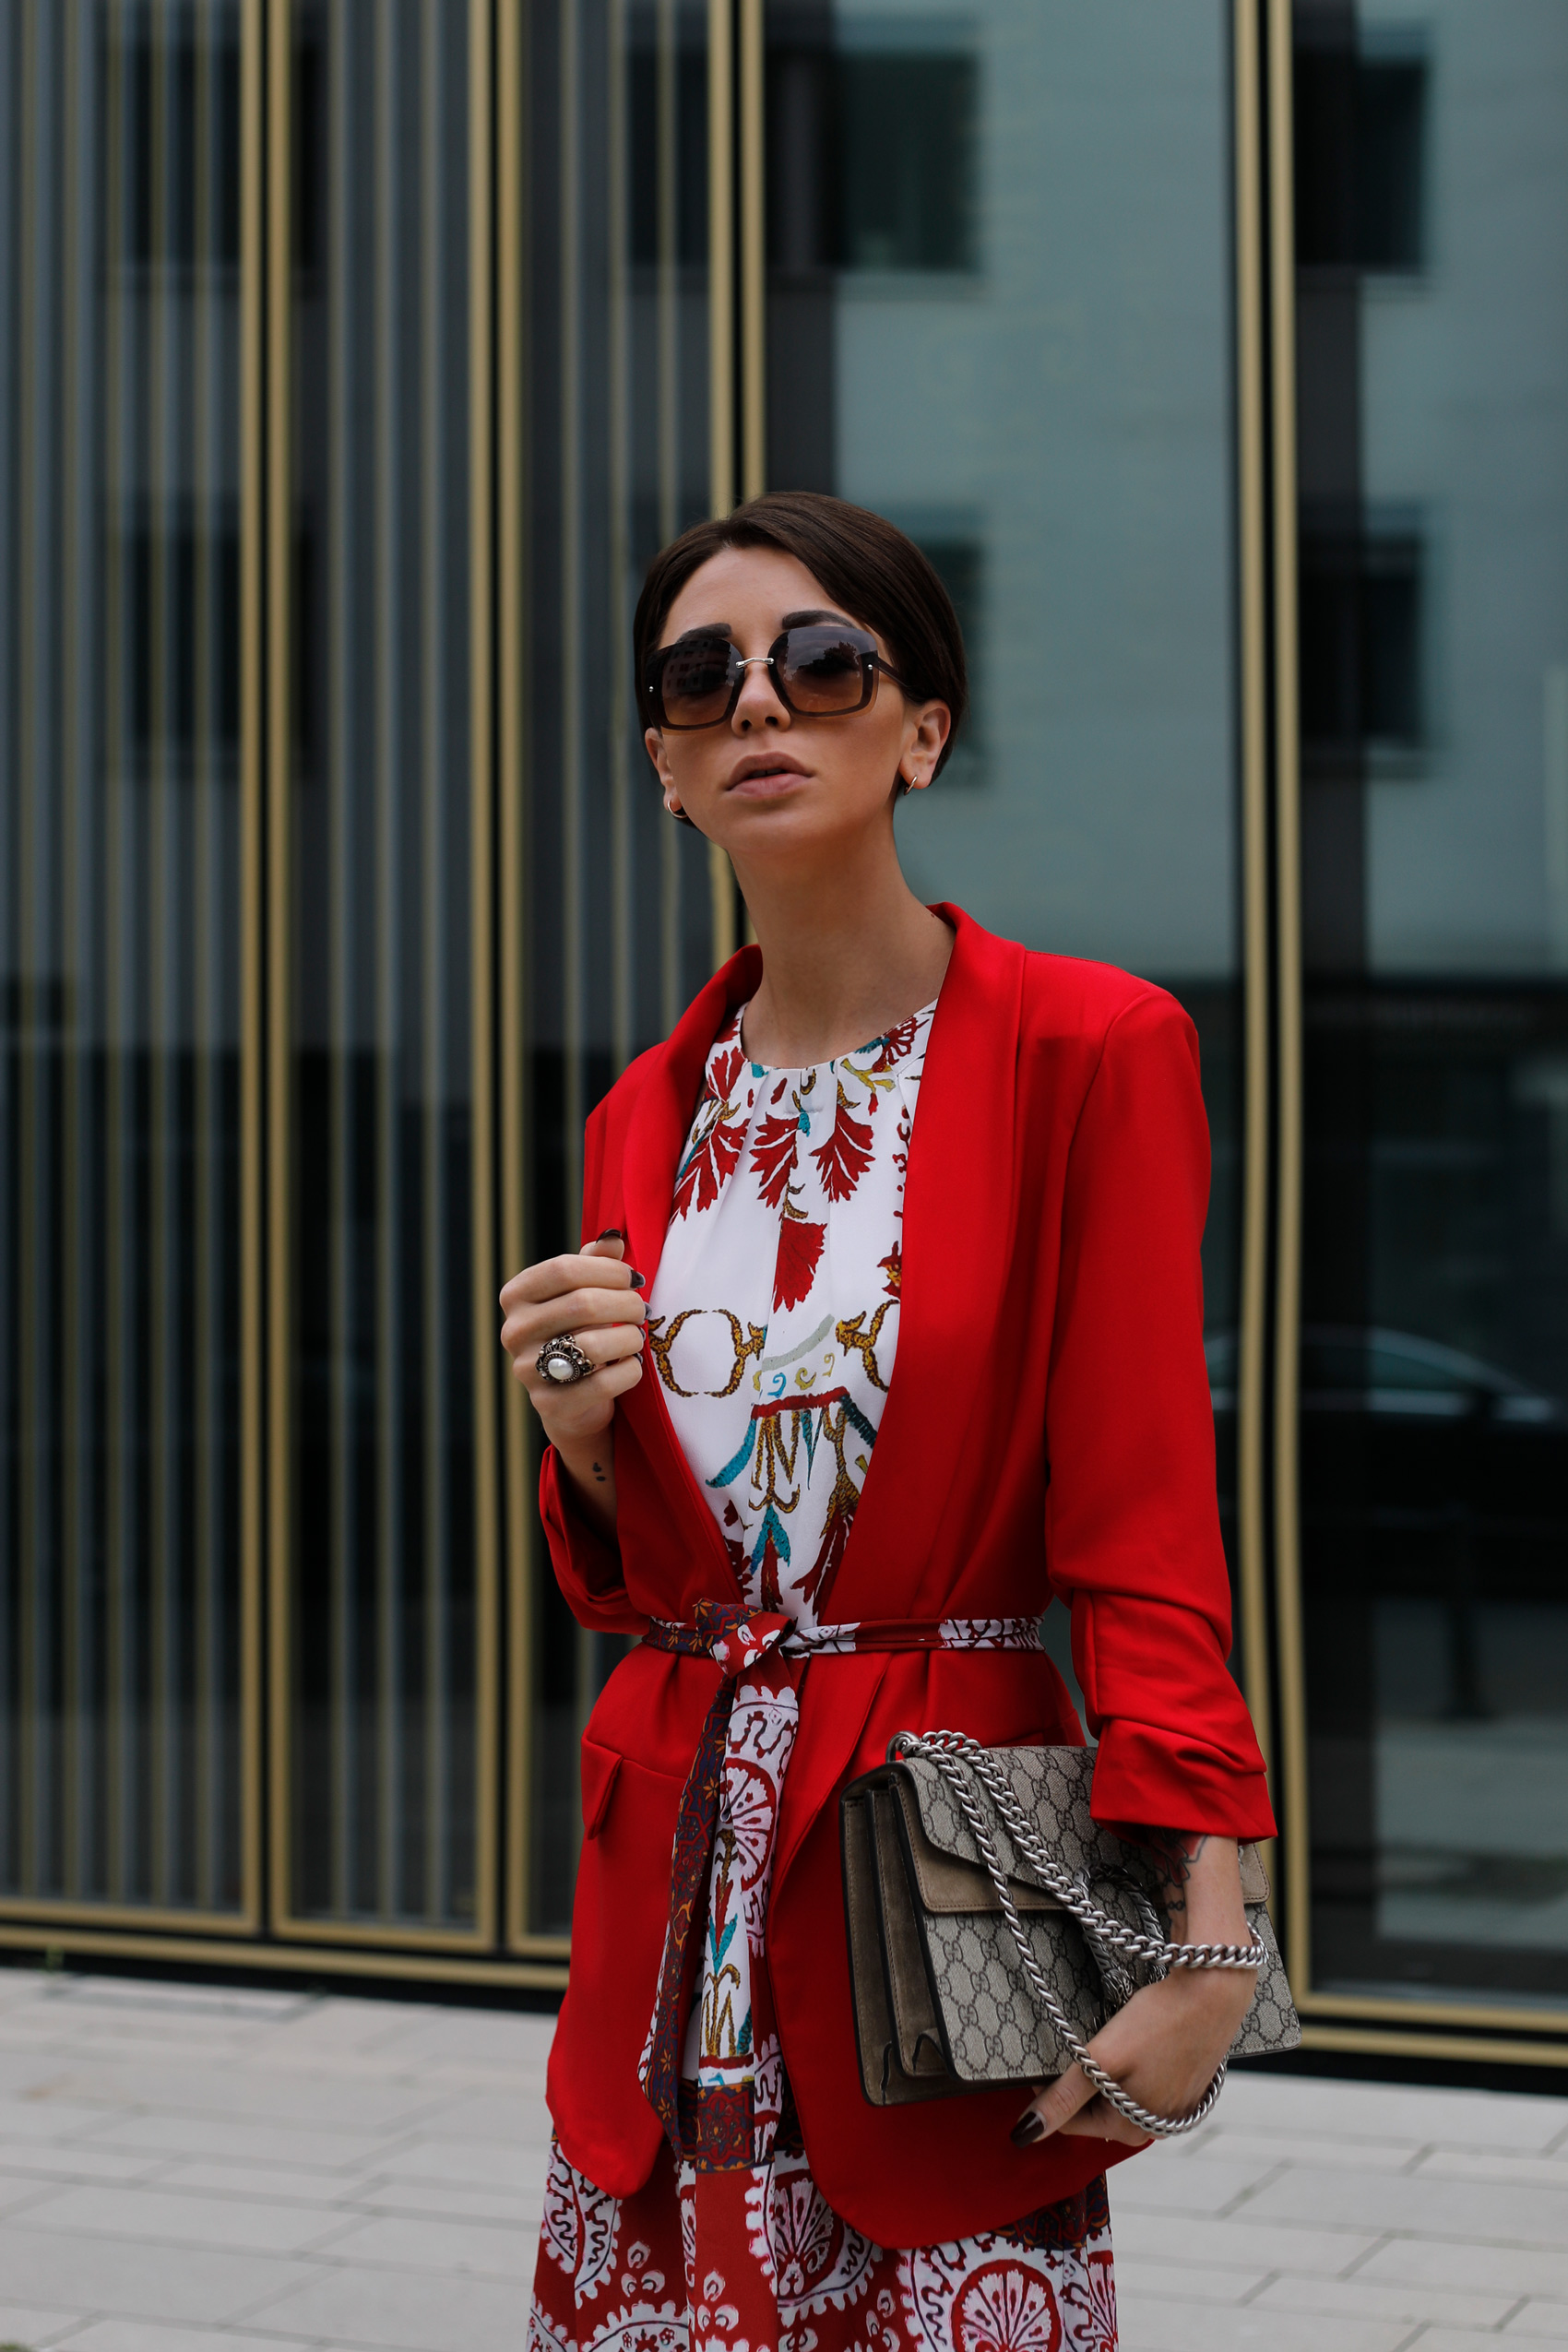 kala-fashion-berlin-sommerkleid-blumenmuster-outfit-deutsche-modeblogger-luxusblogger-jasmin-kessler-couture-de-coeur